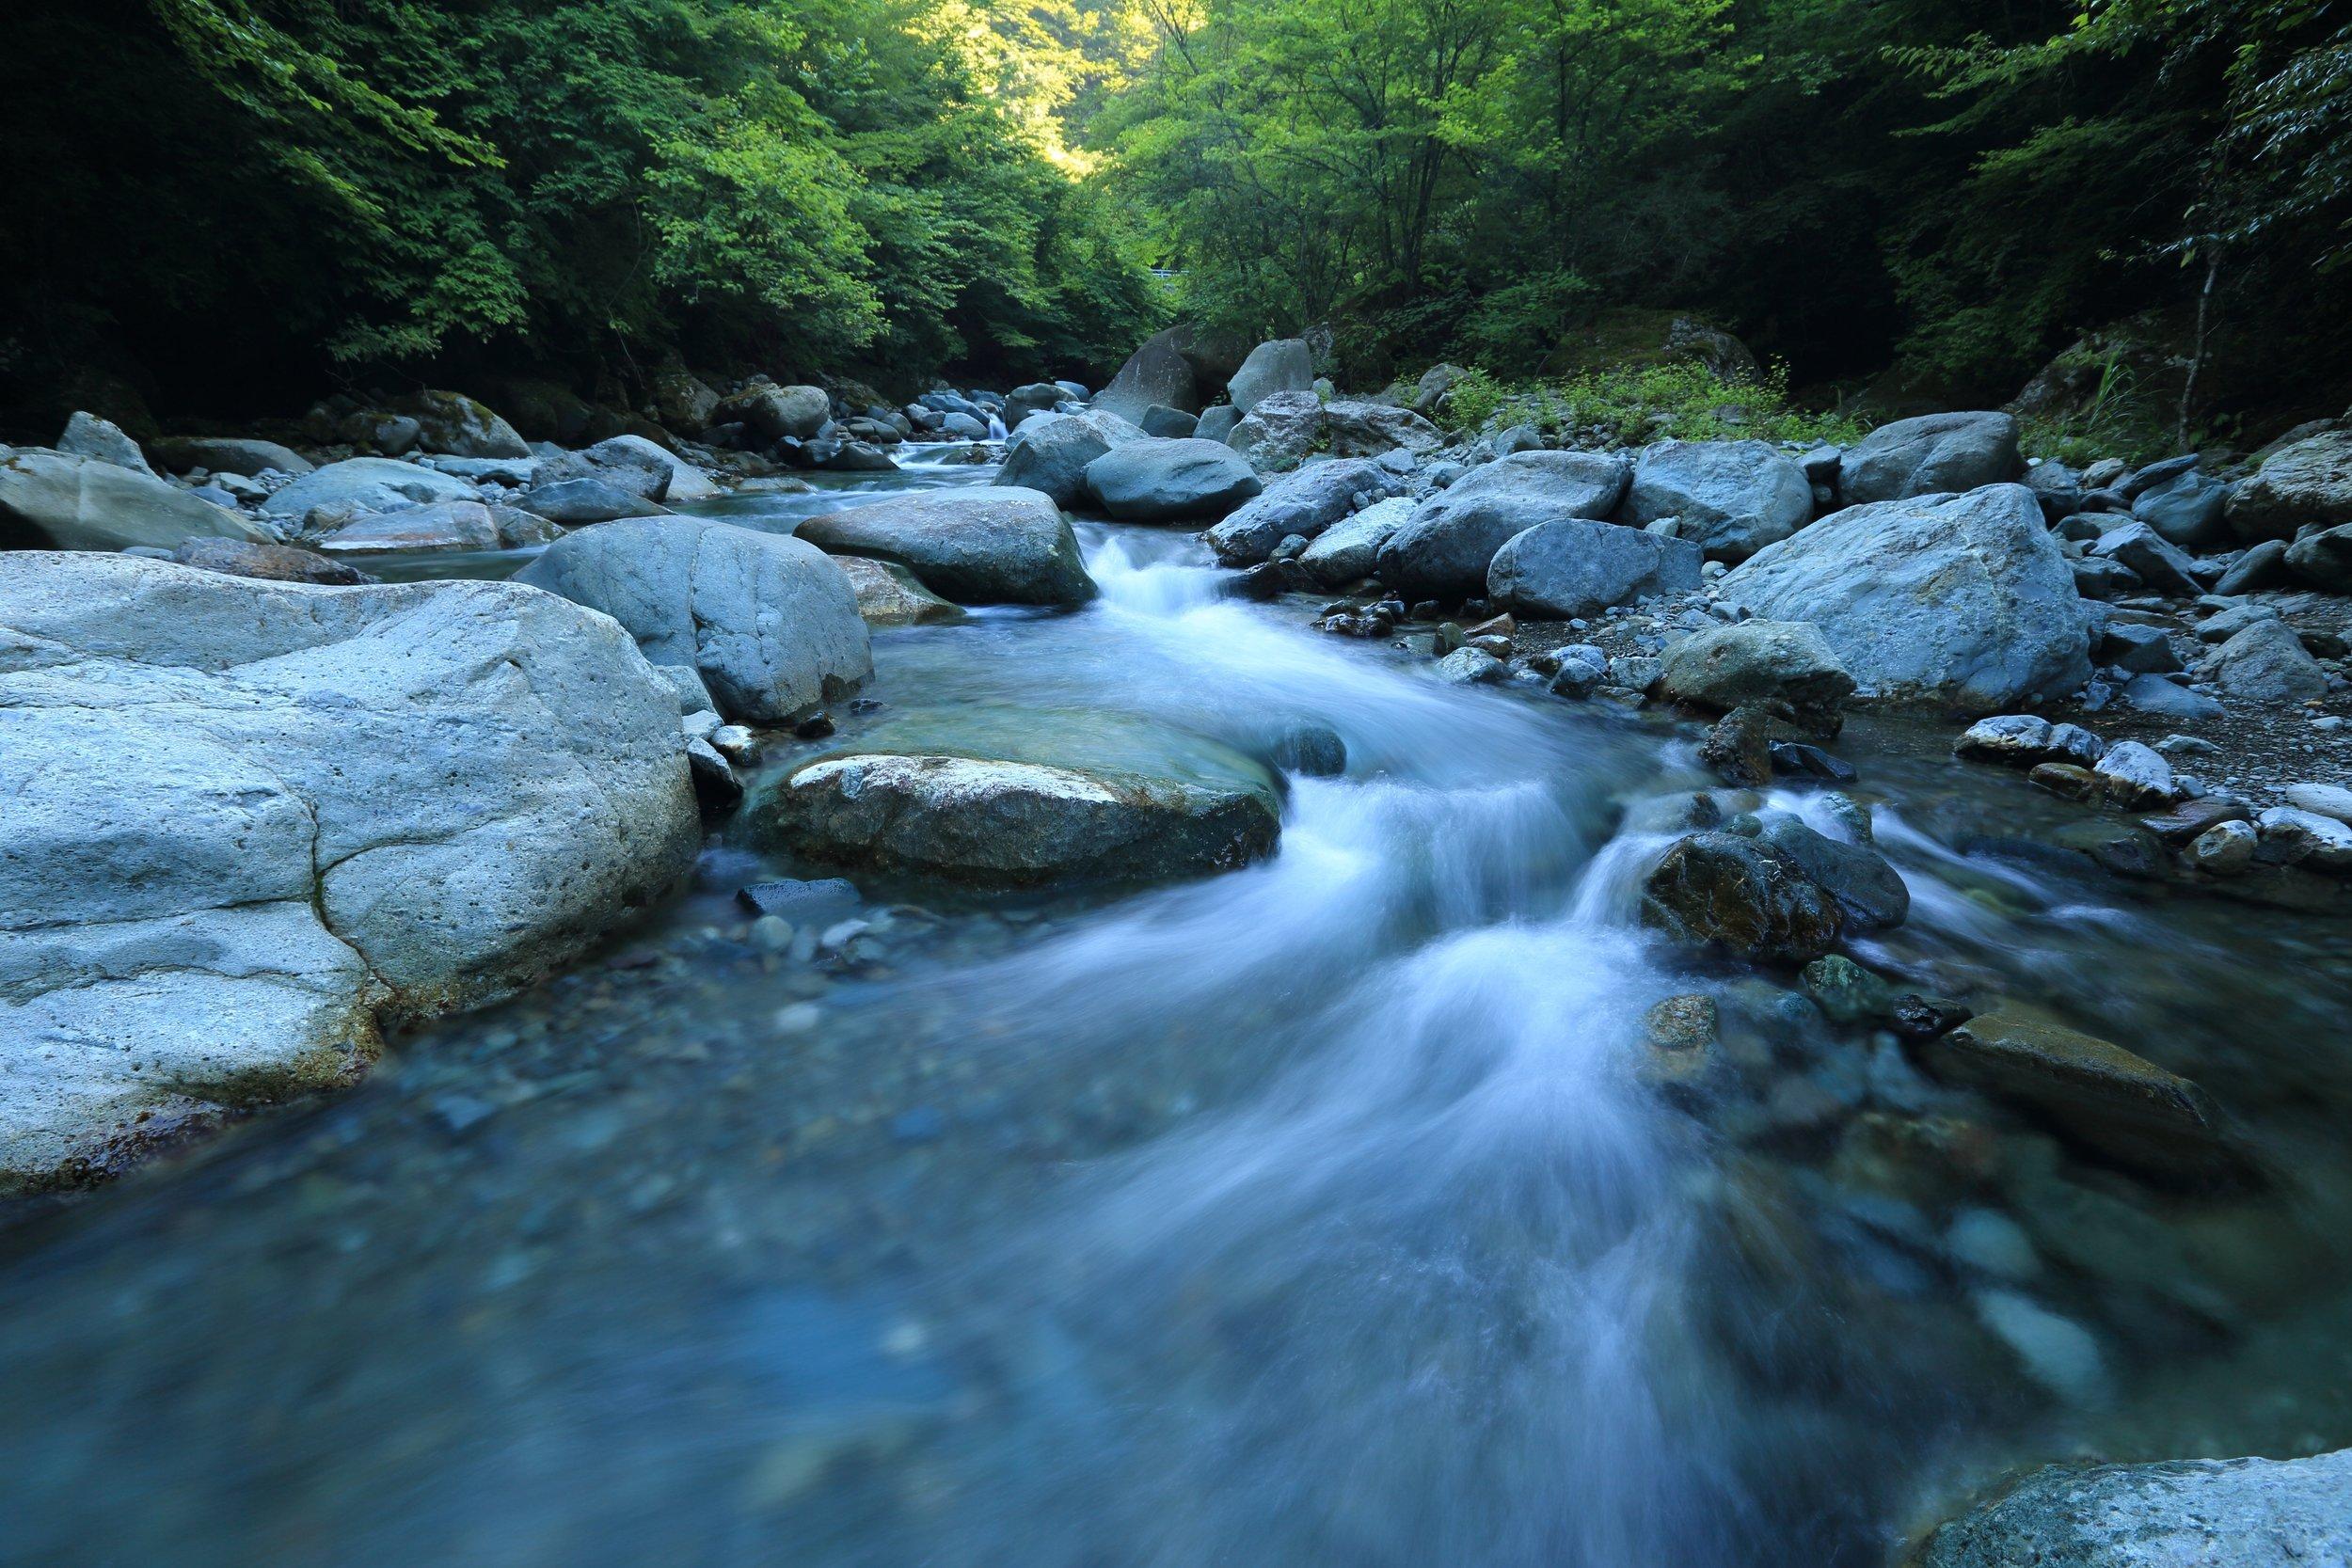 stream-rocks.jpg